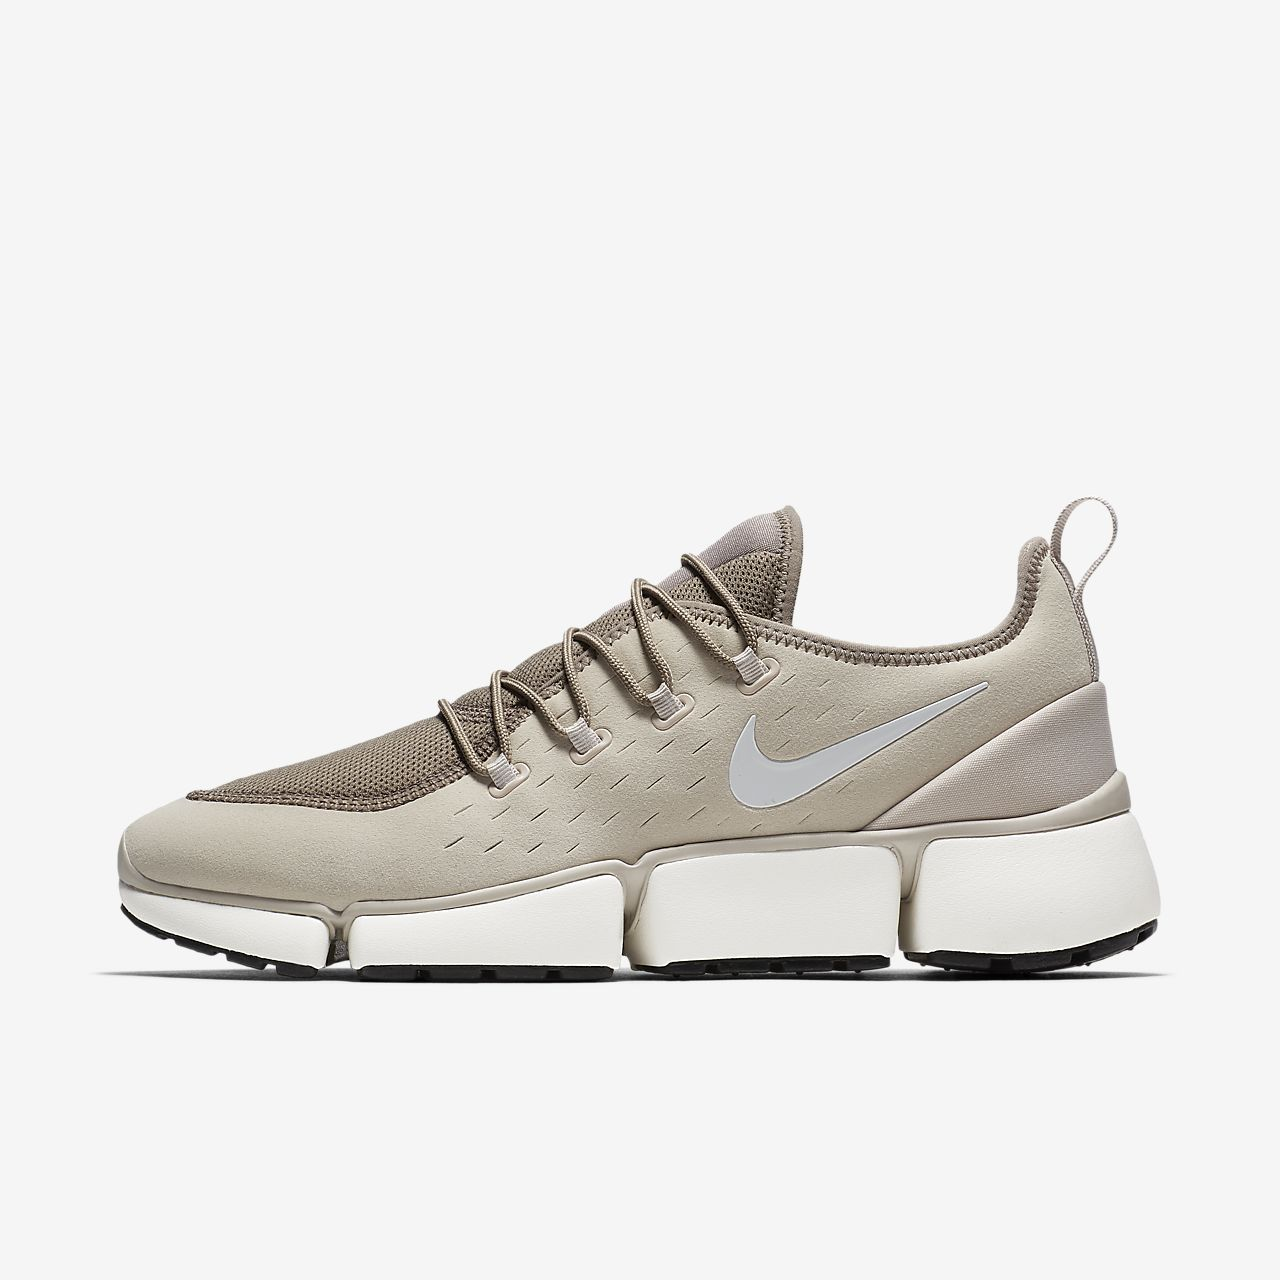 Nike Sportswear POCKET FLY - Trainers - desert sand/white/sepia stone/sail/black nzUSj